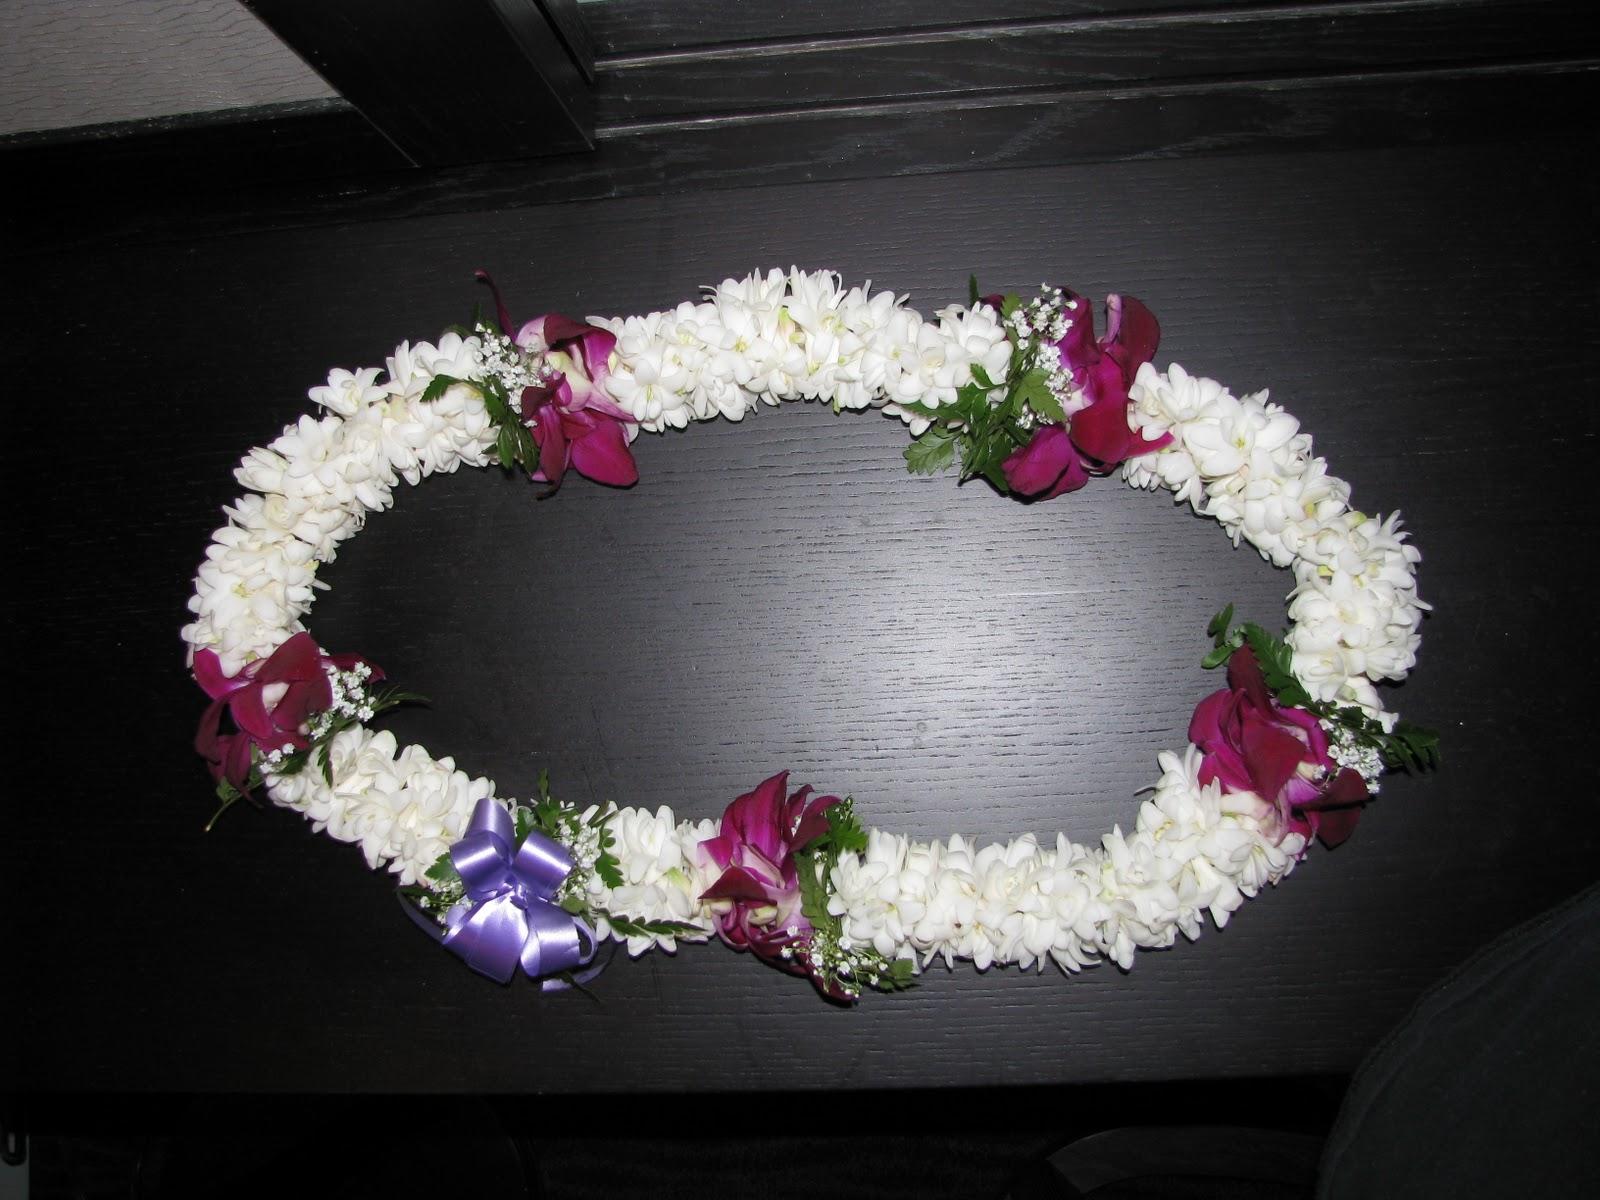 Hawaiian flower lei greetings izmirmasajfo Images